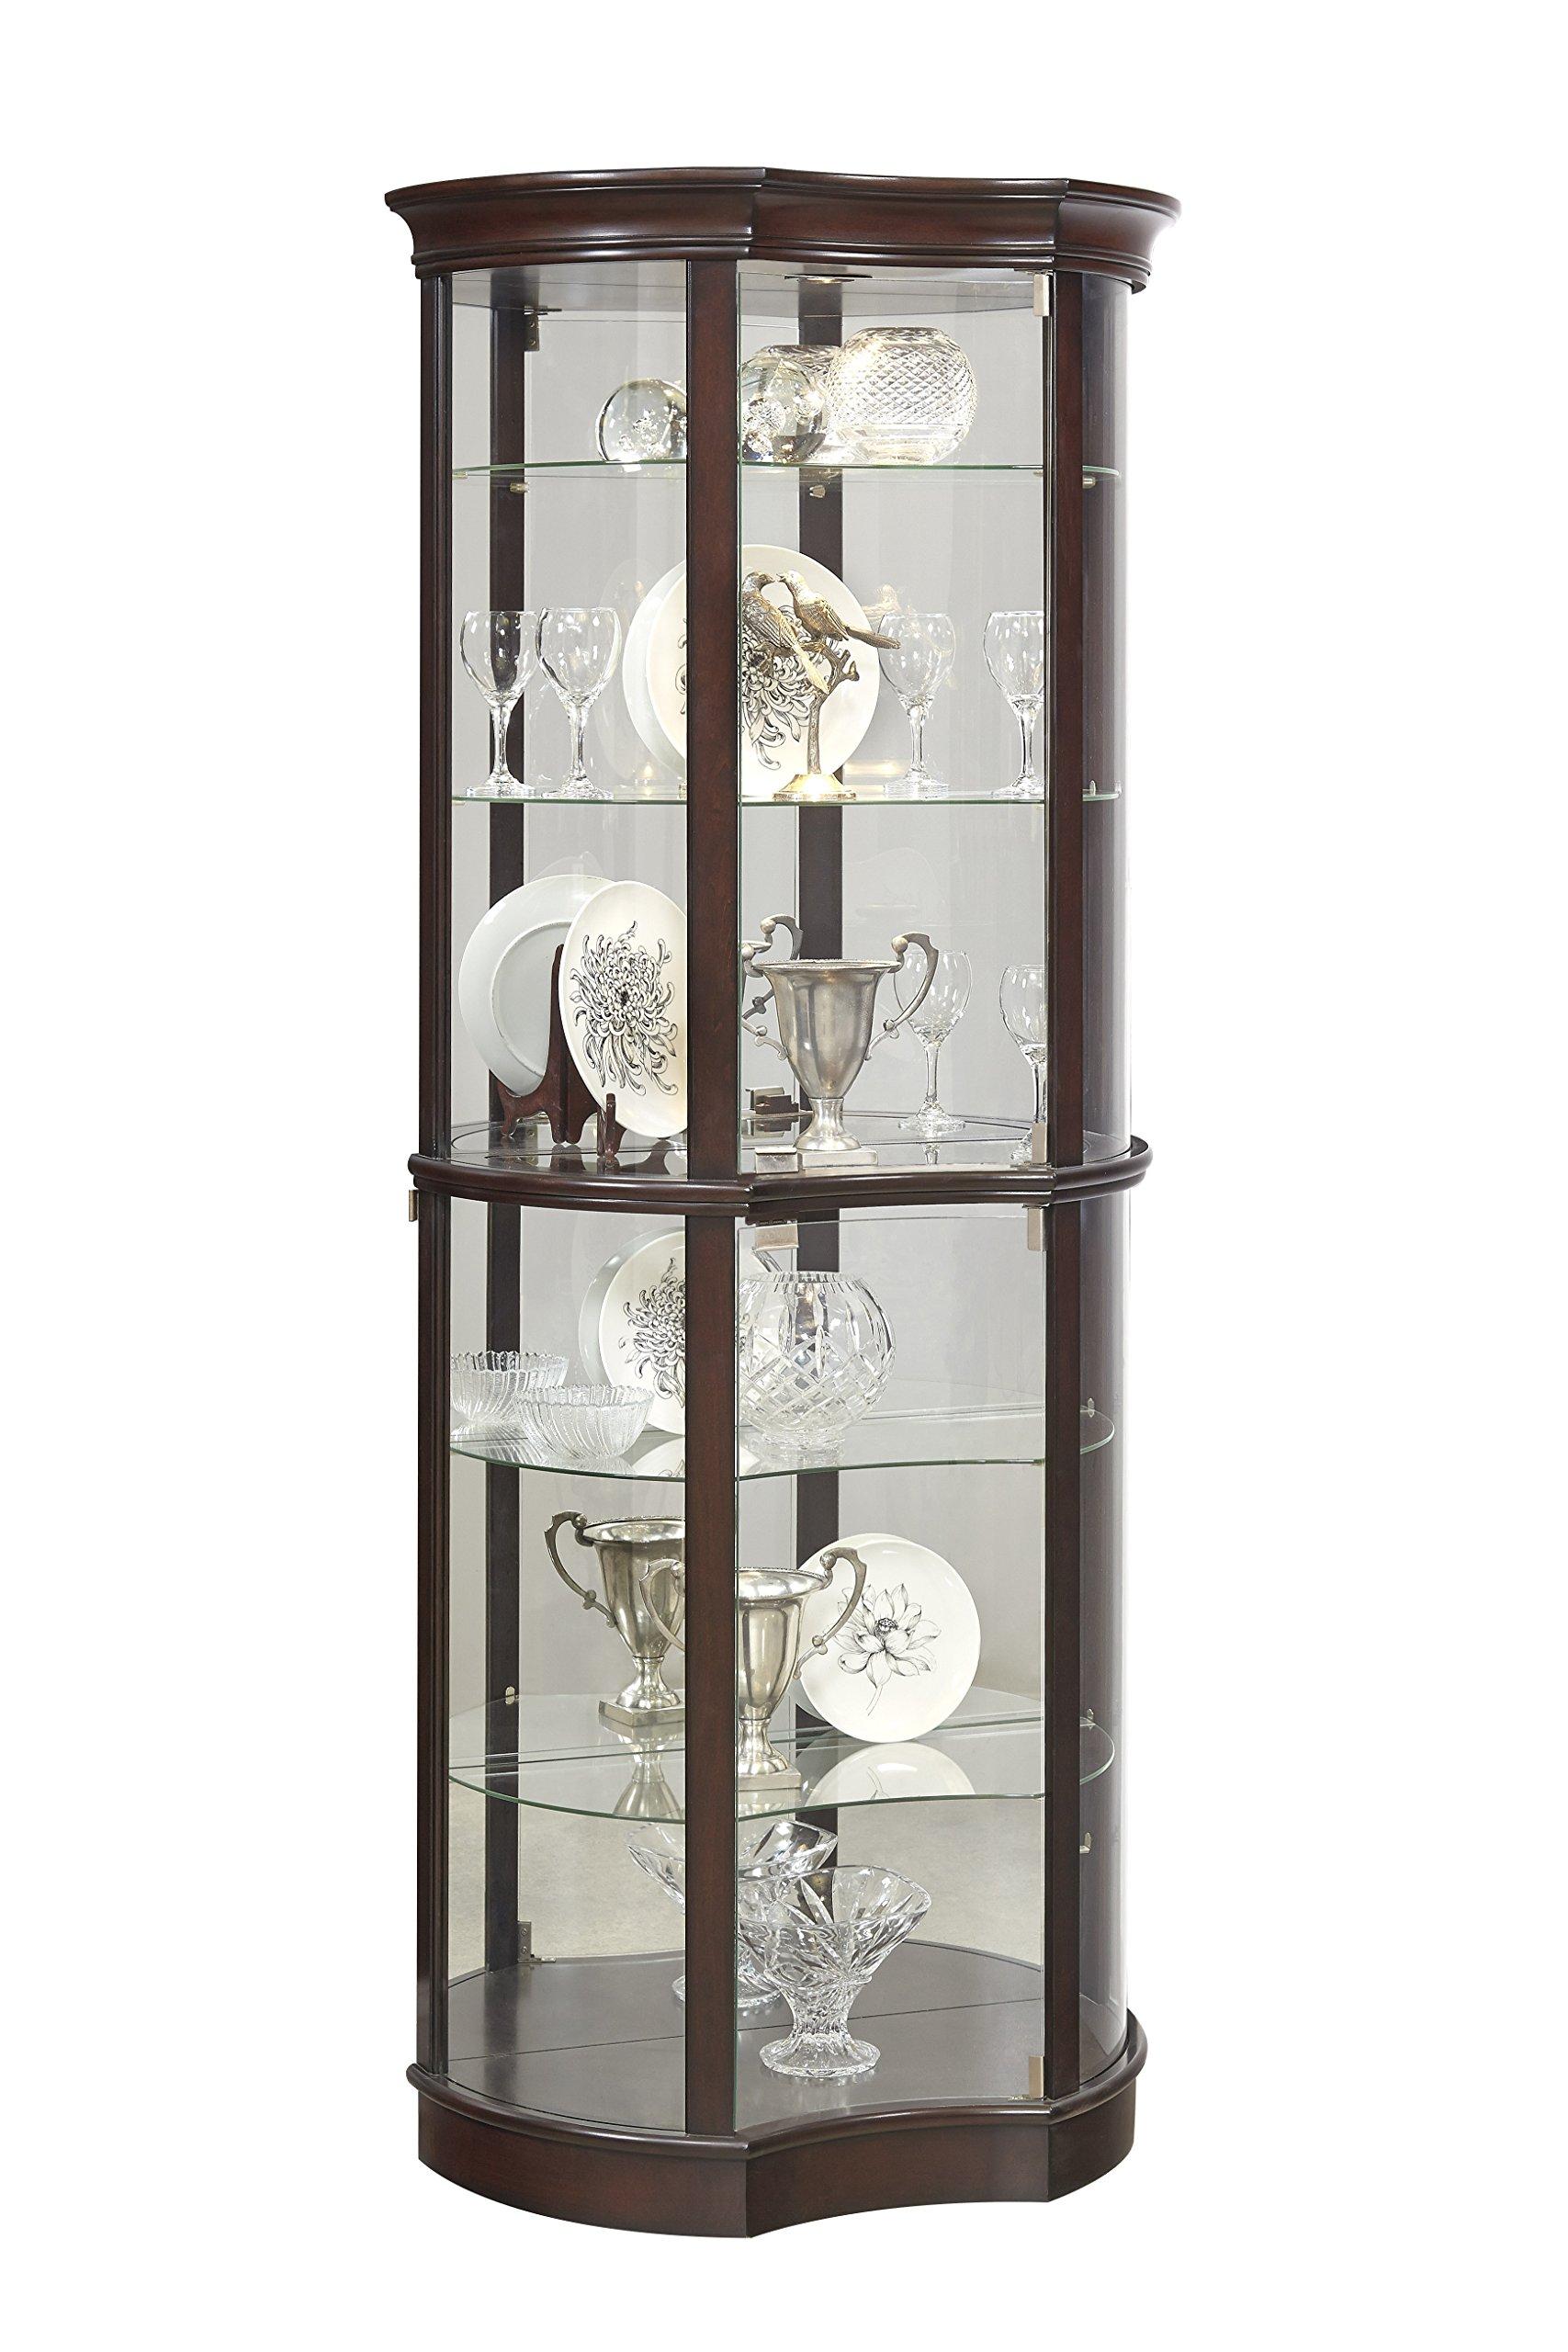 Pulaski P021563 Sable Concave Front Mirrored Curio Cabinet 32.0'' x 15.4'' x 76.1''